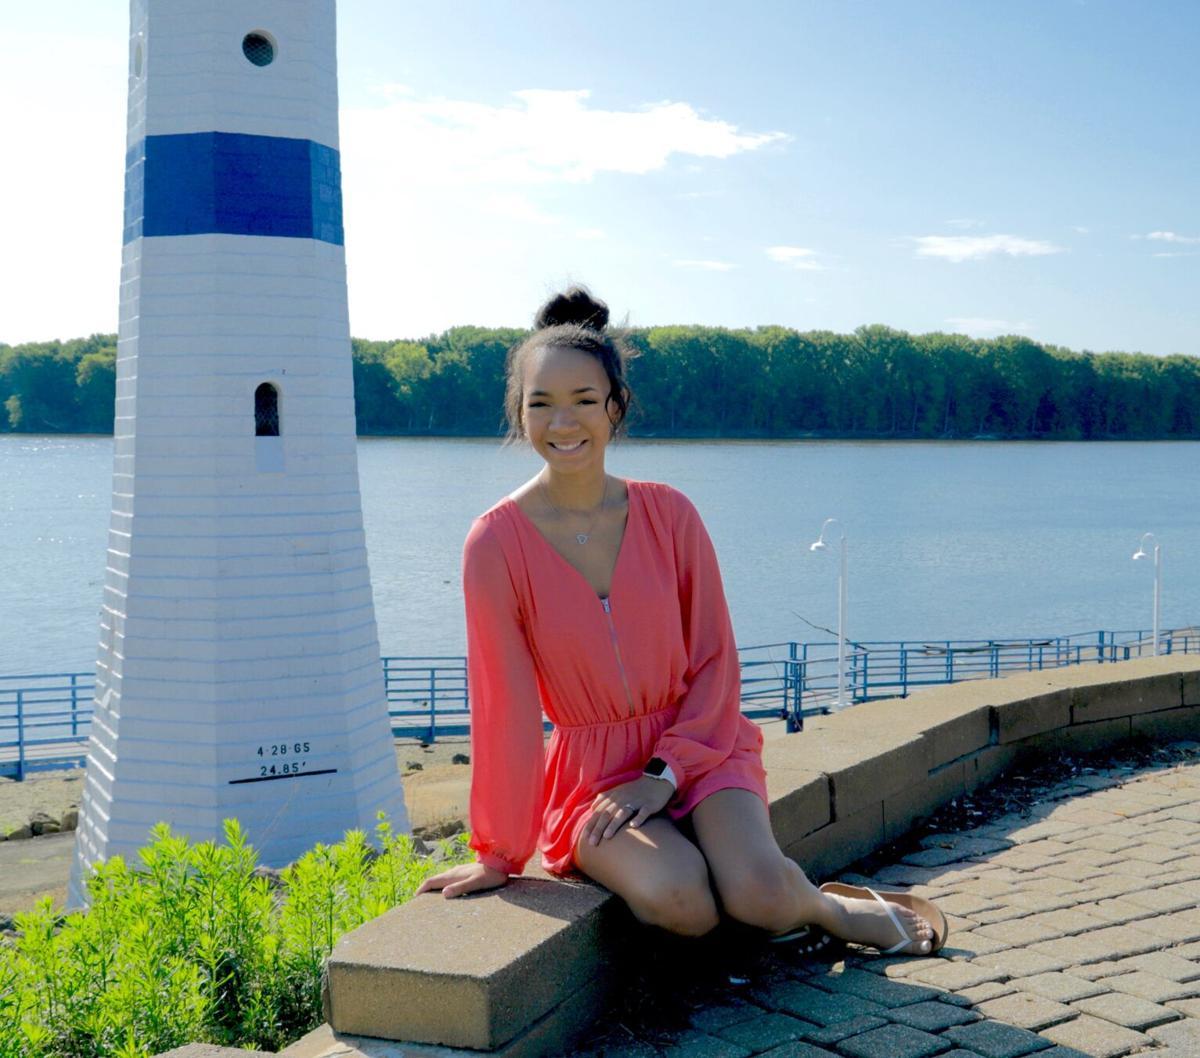 kira price by river, lighthouse